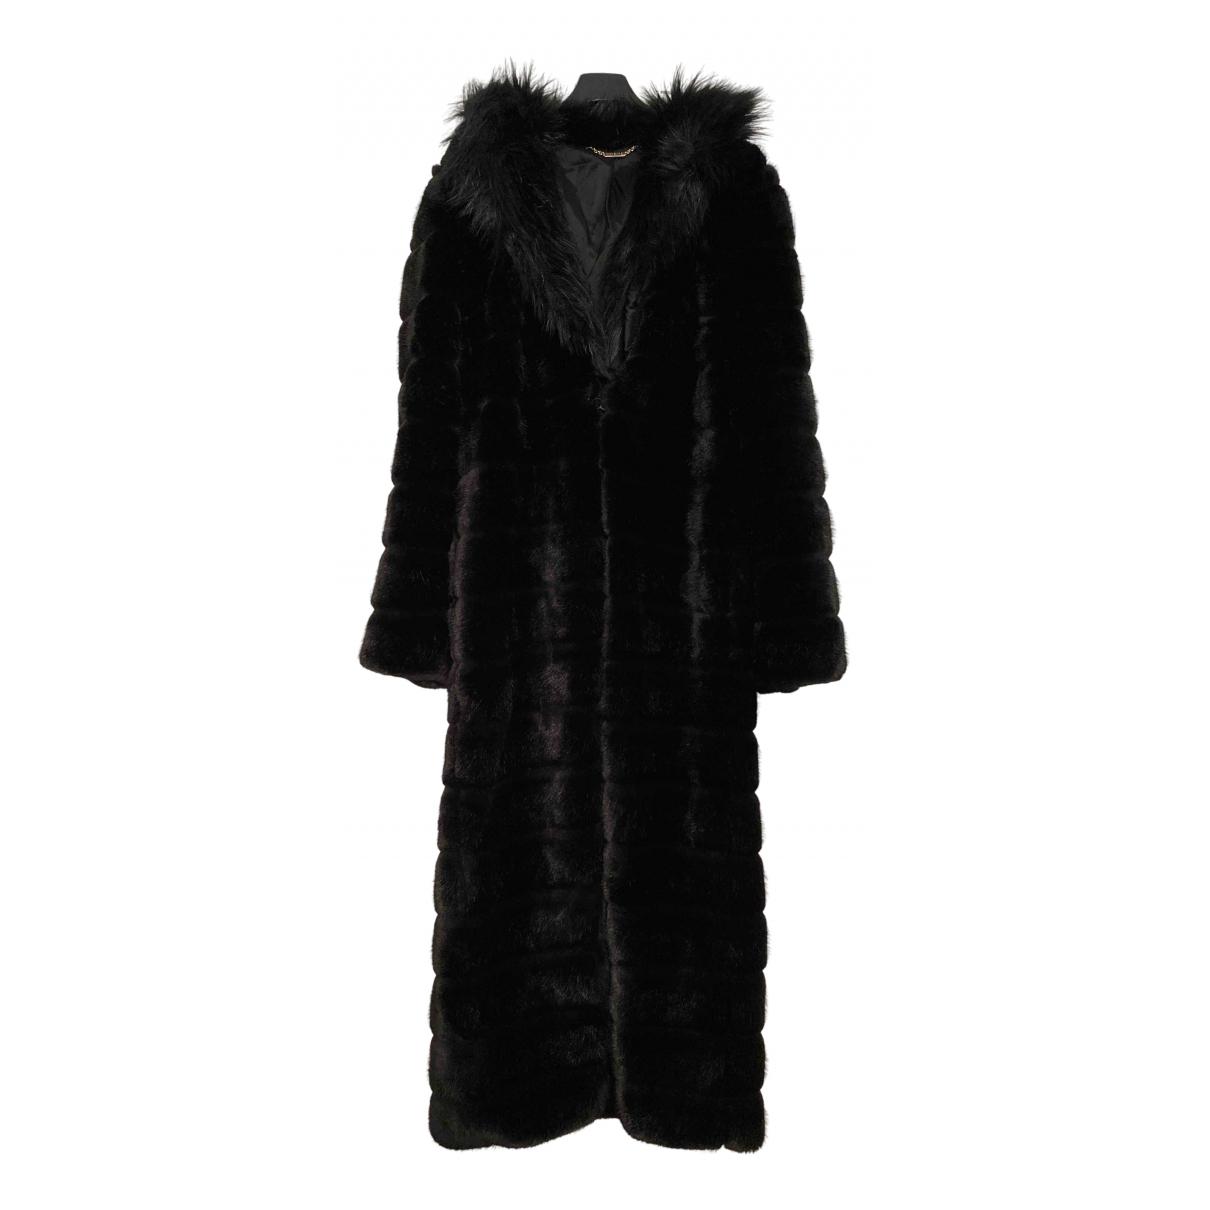 Mangano \N Black Faux fur coat for Women 40 IT